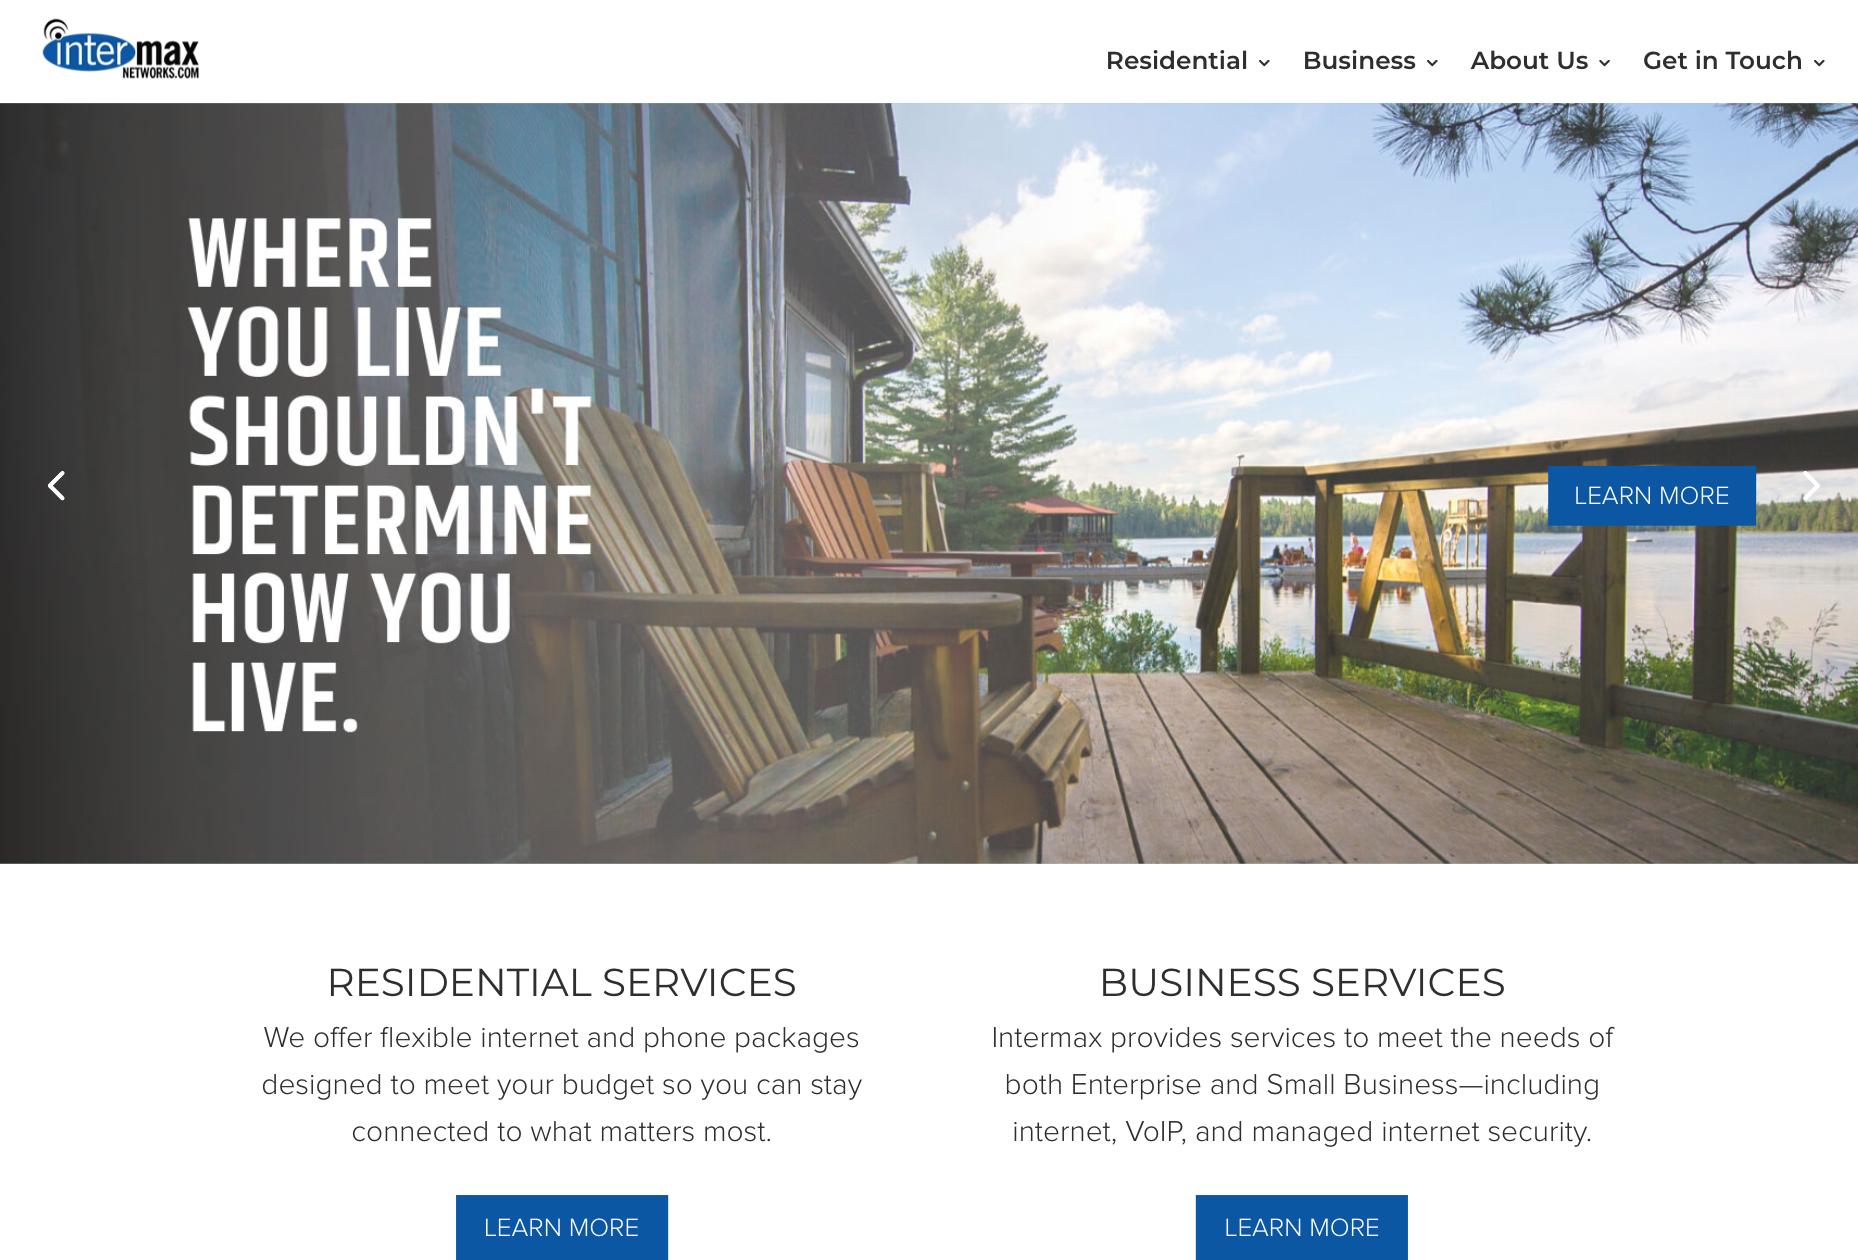 Intermax website screenshot